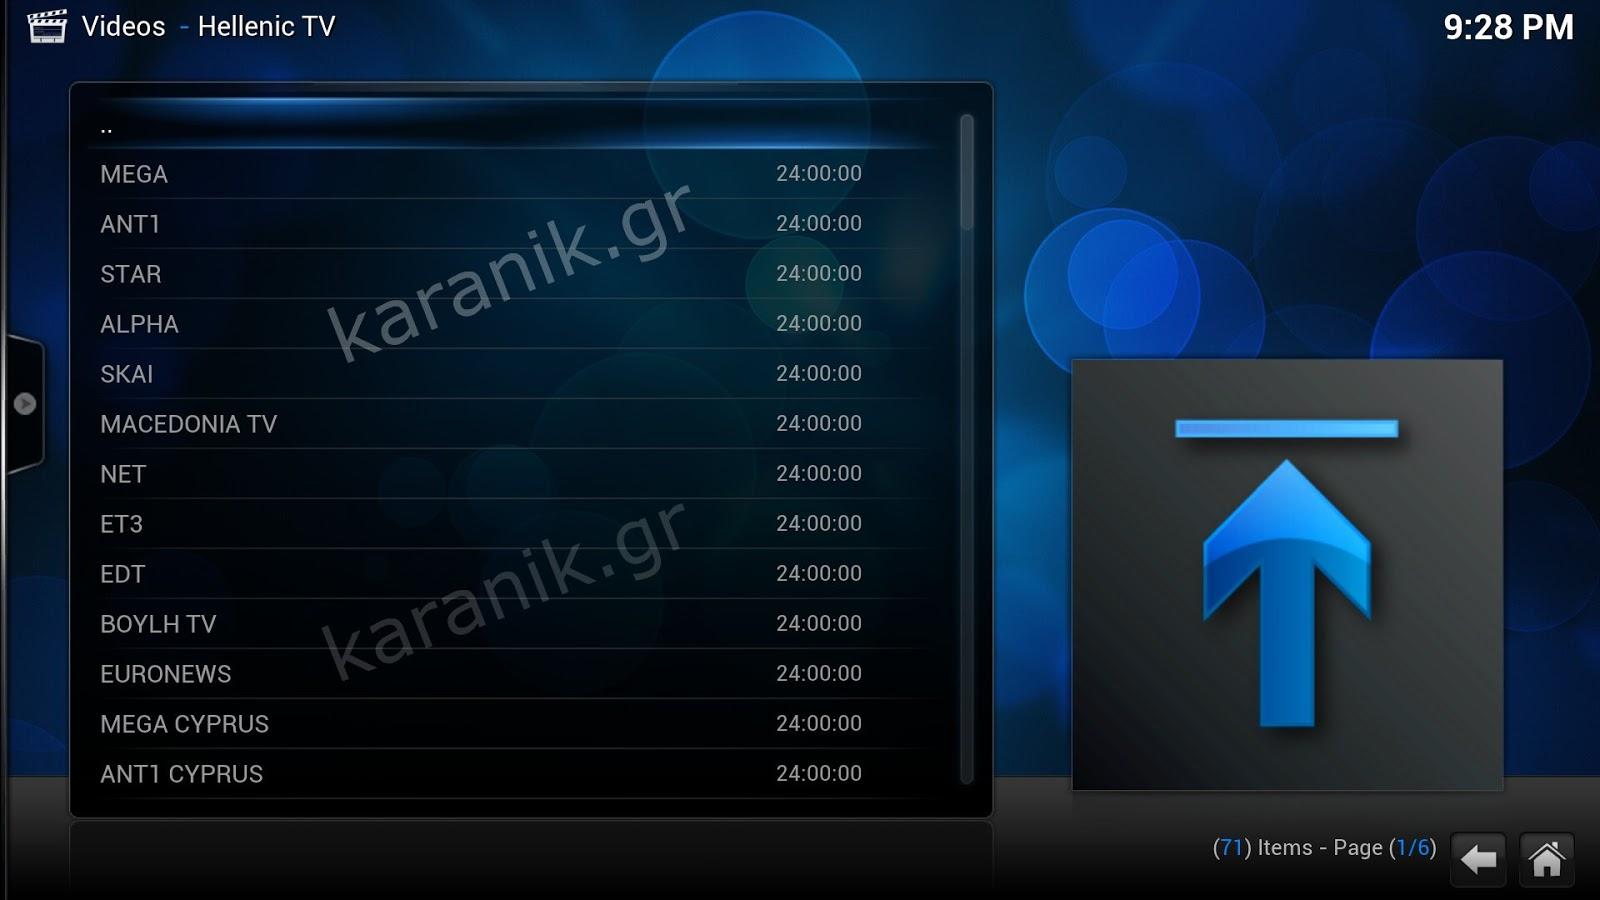 Tαινίες και live streaming στο XBMC [KODI] , ΟΛΑ ΤΑ ΕΛΛΗΝΙΚΑ